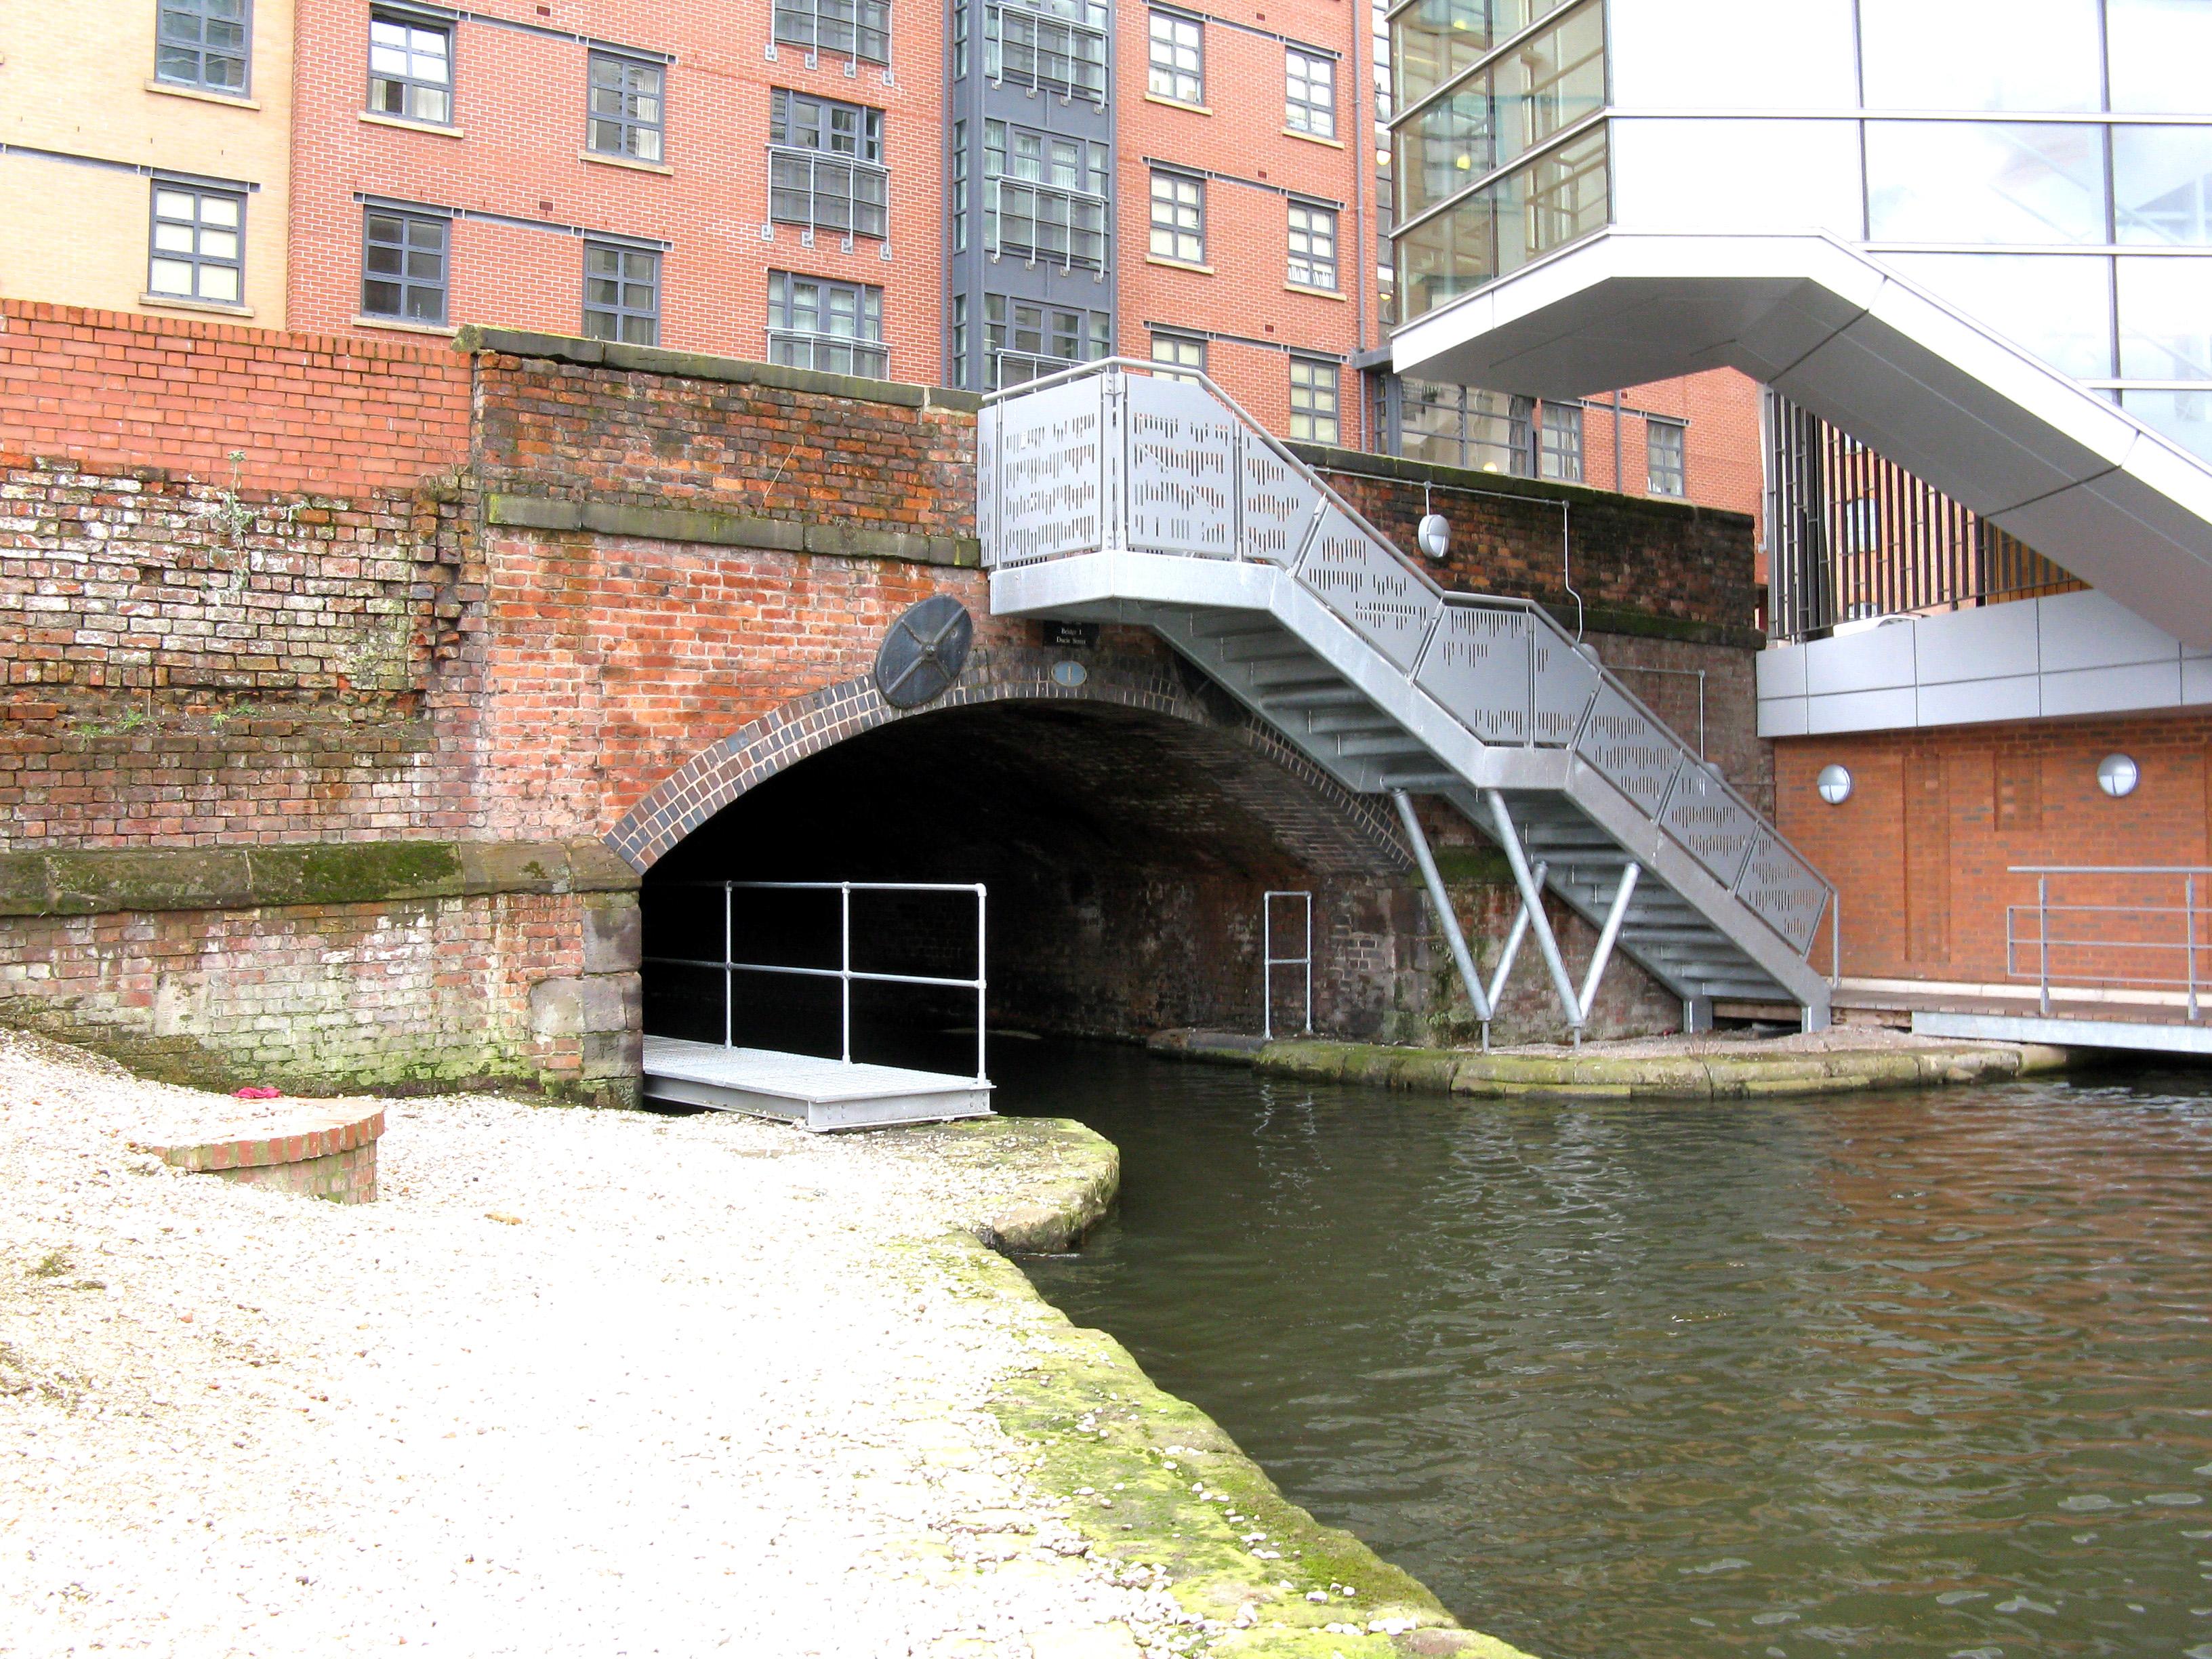 File:Manchester, Ashton Canal, Ducie Street Bridge 1 - geograph.org.uk -  1700252.jpg - Wikimedia Commons